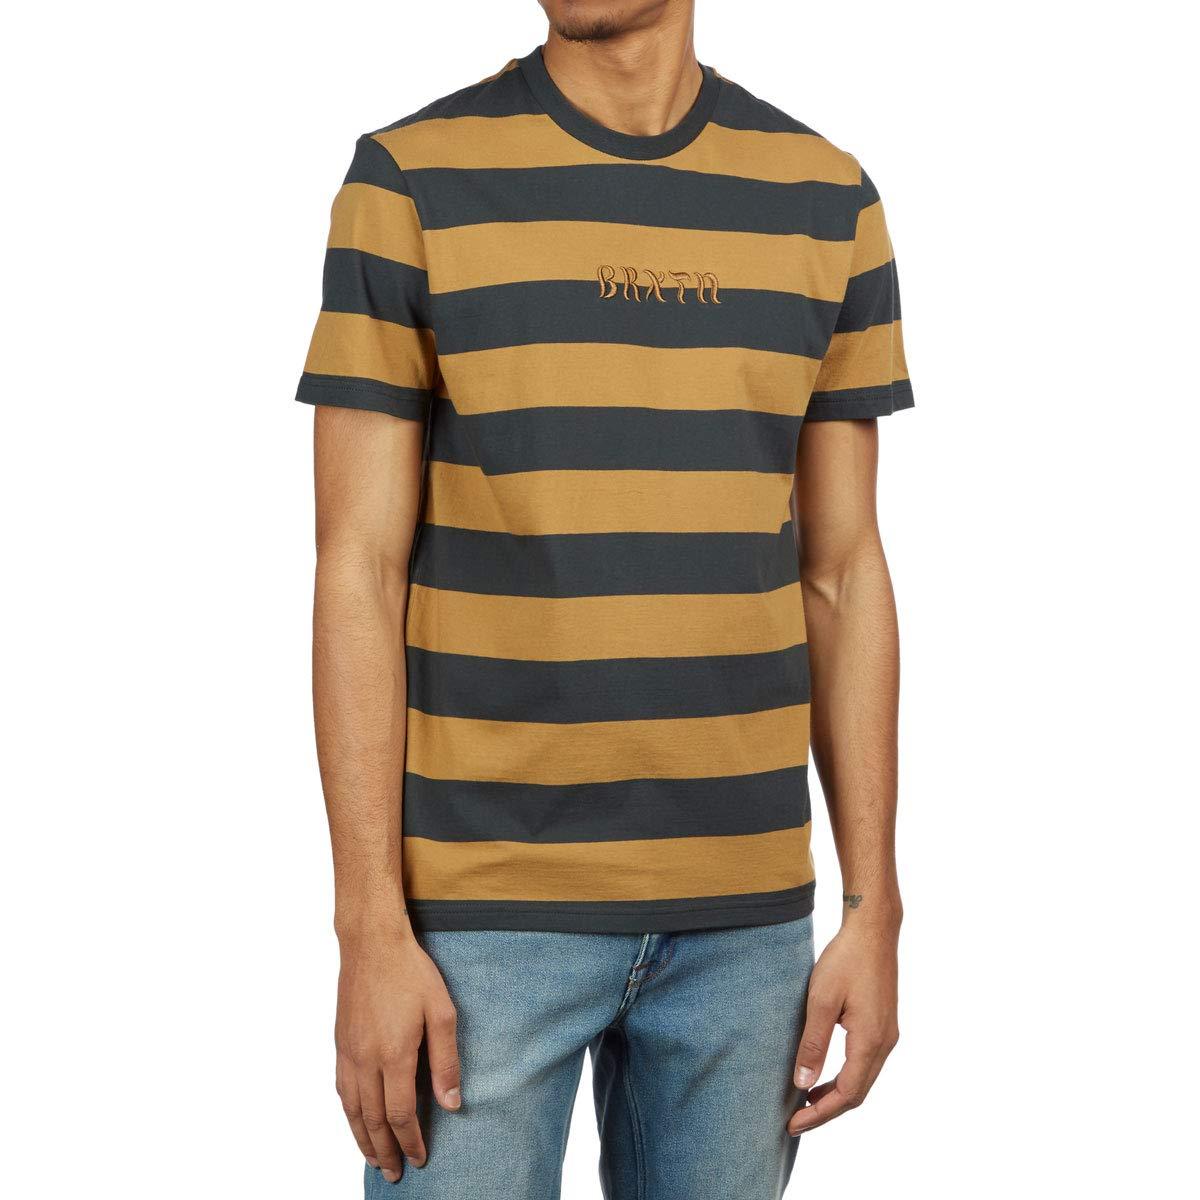 Brixton March Shirt Washed Black//Gold